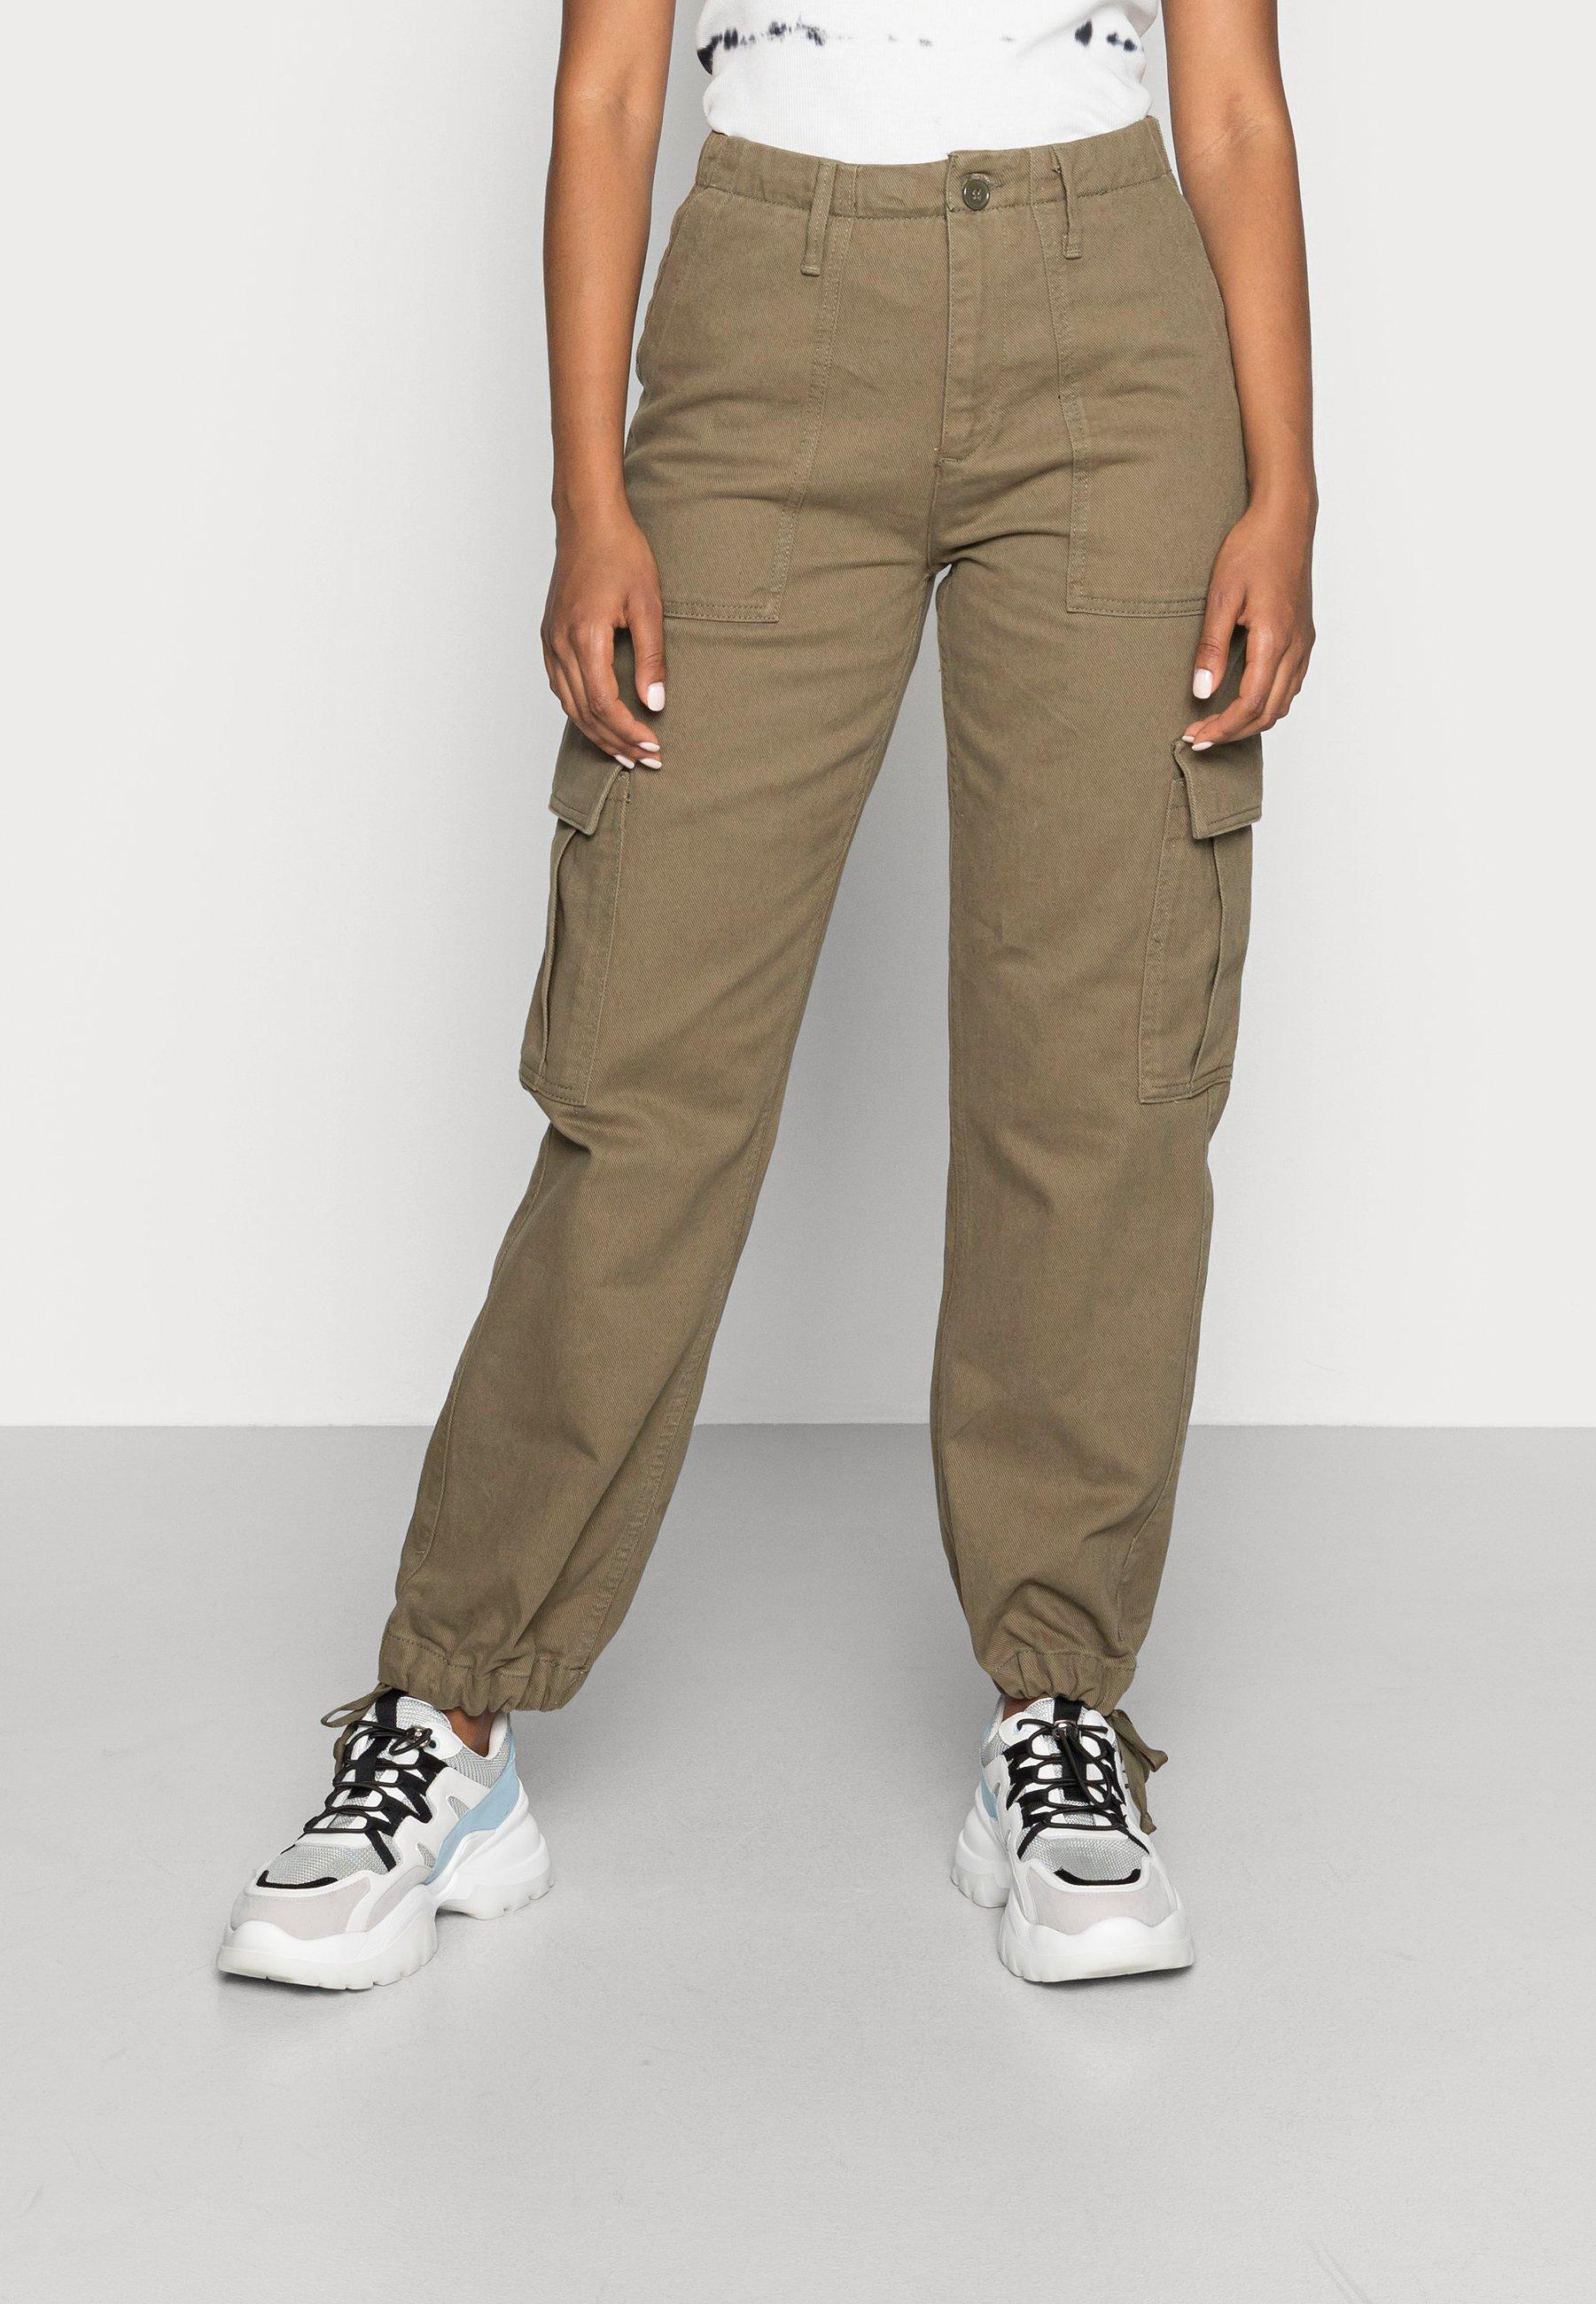 Femme AUTHENTIC CARGO PANT - Pantalon cargo